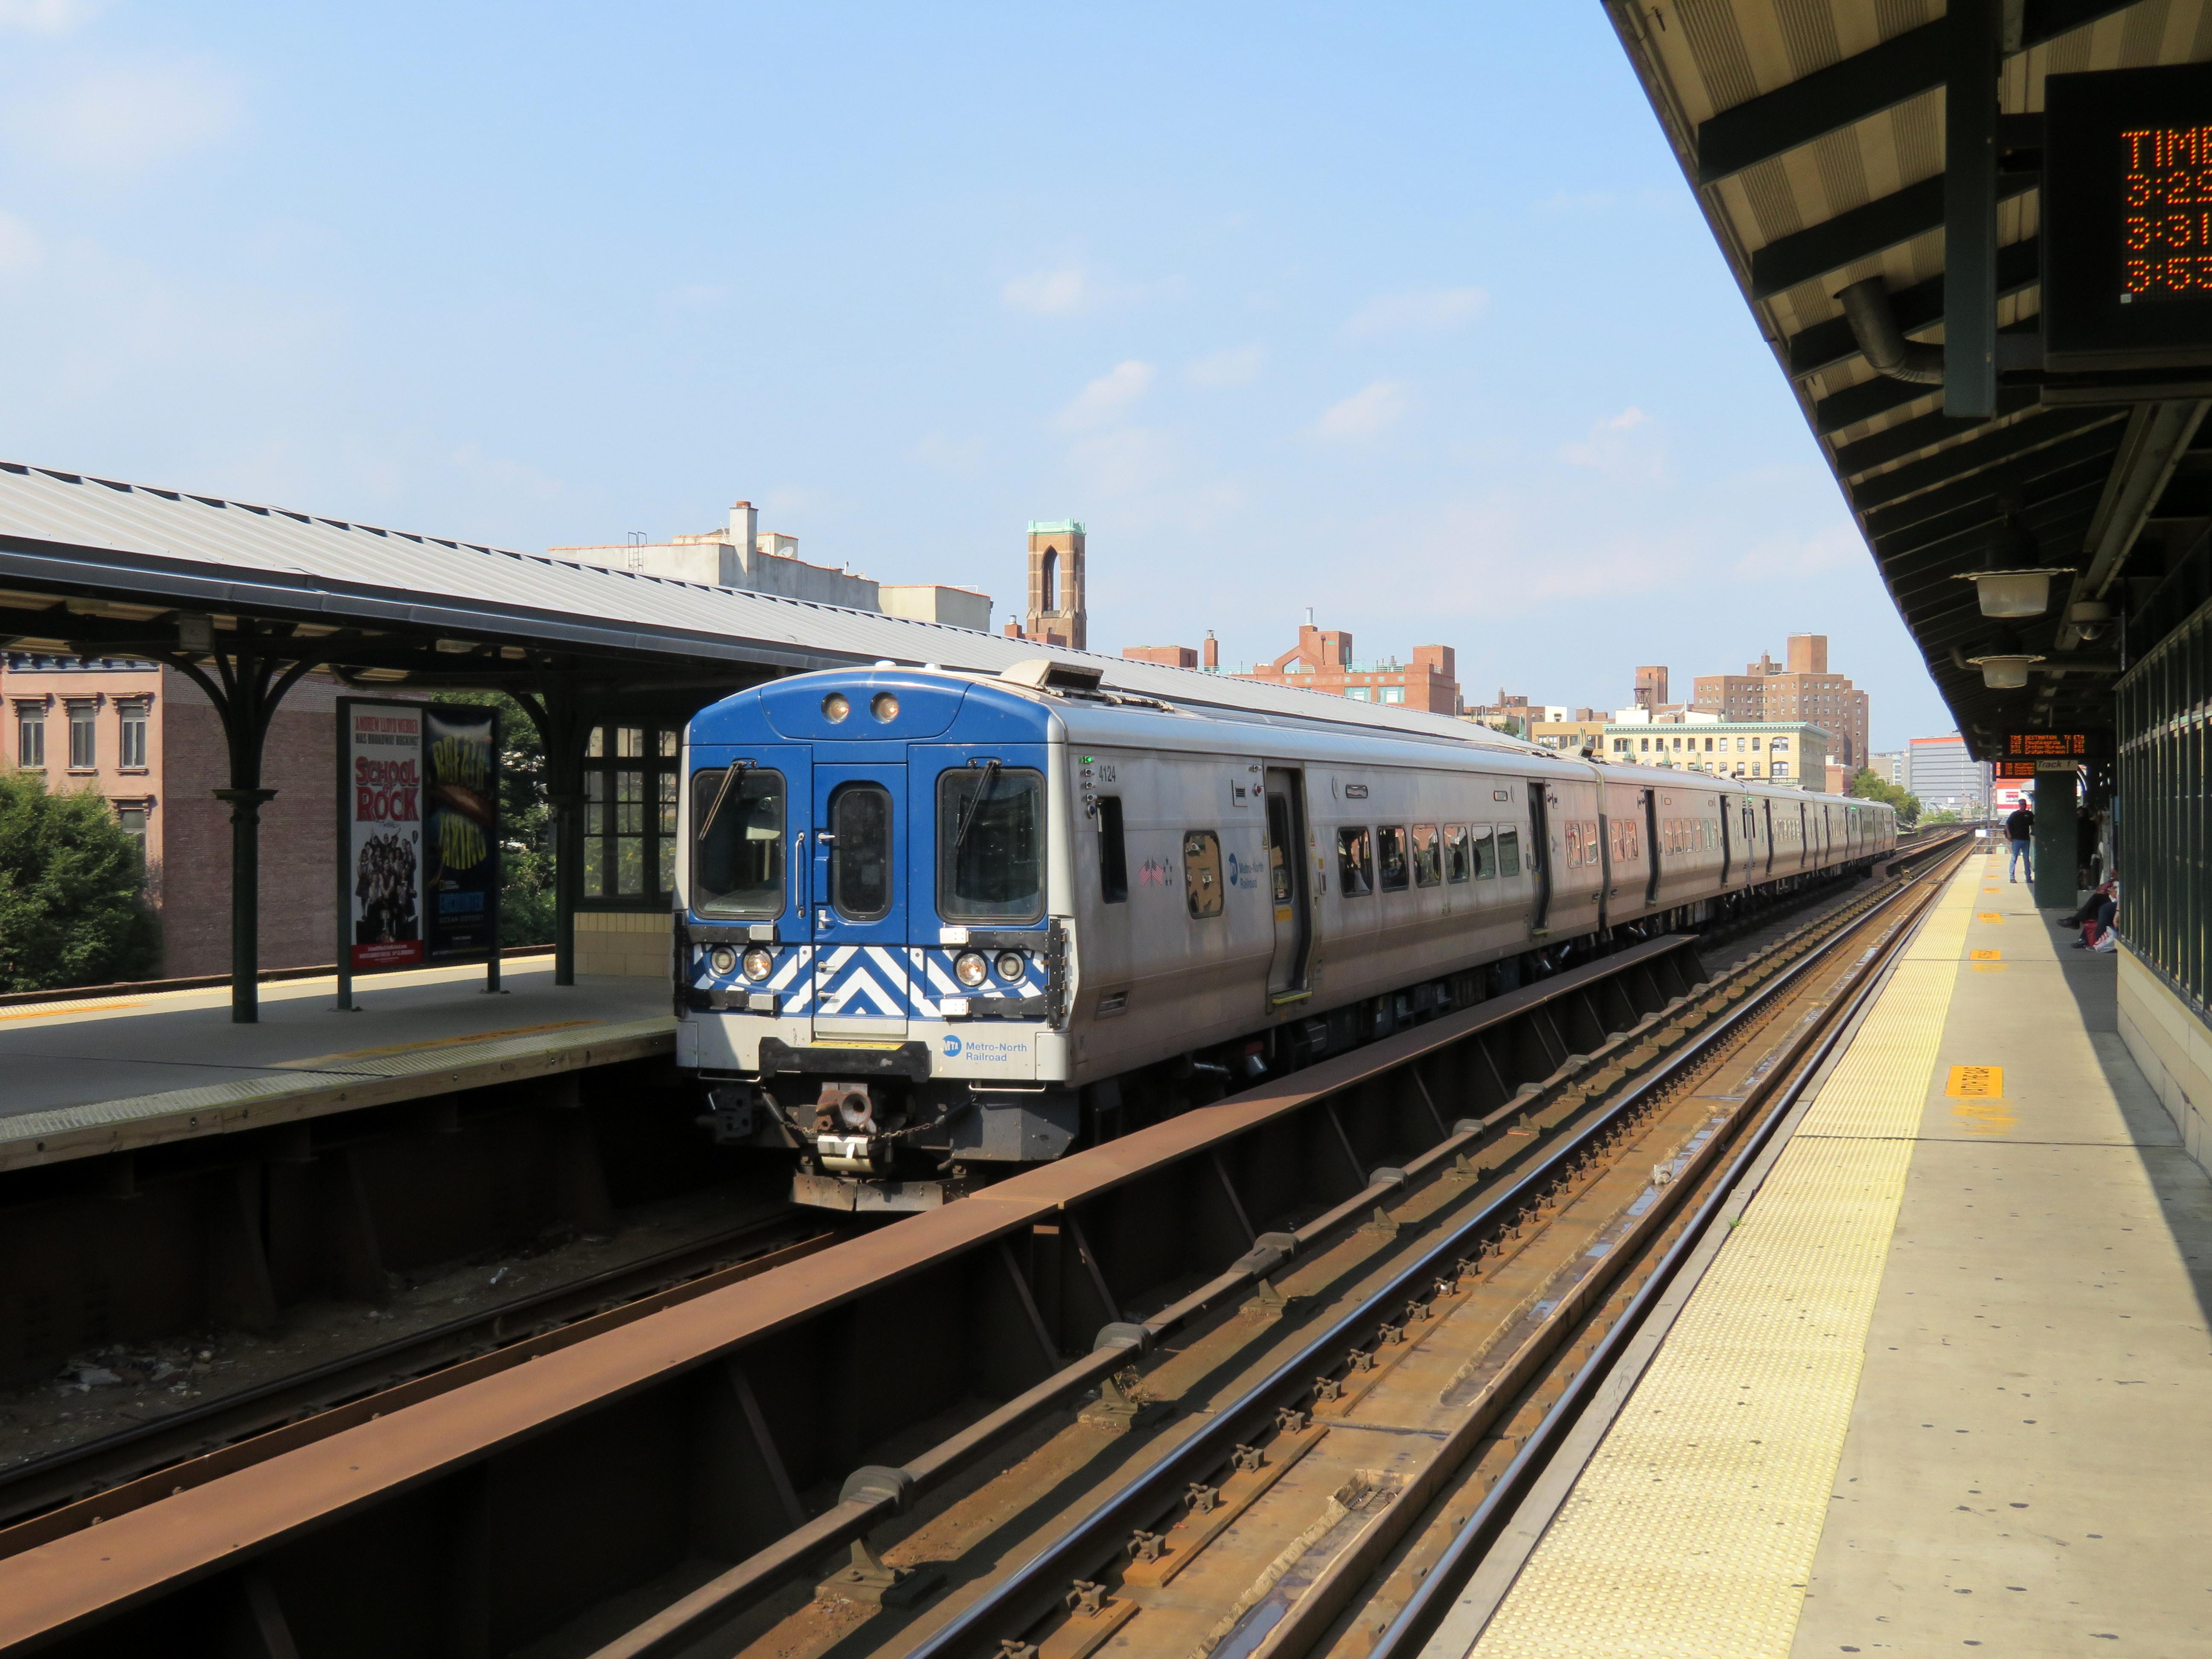 Harlem–125th Street station - Wikipedia